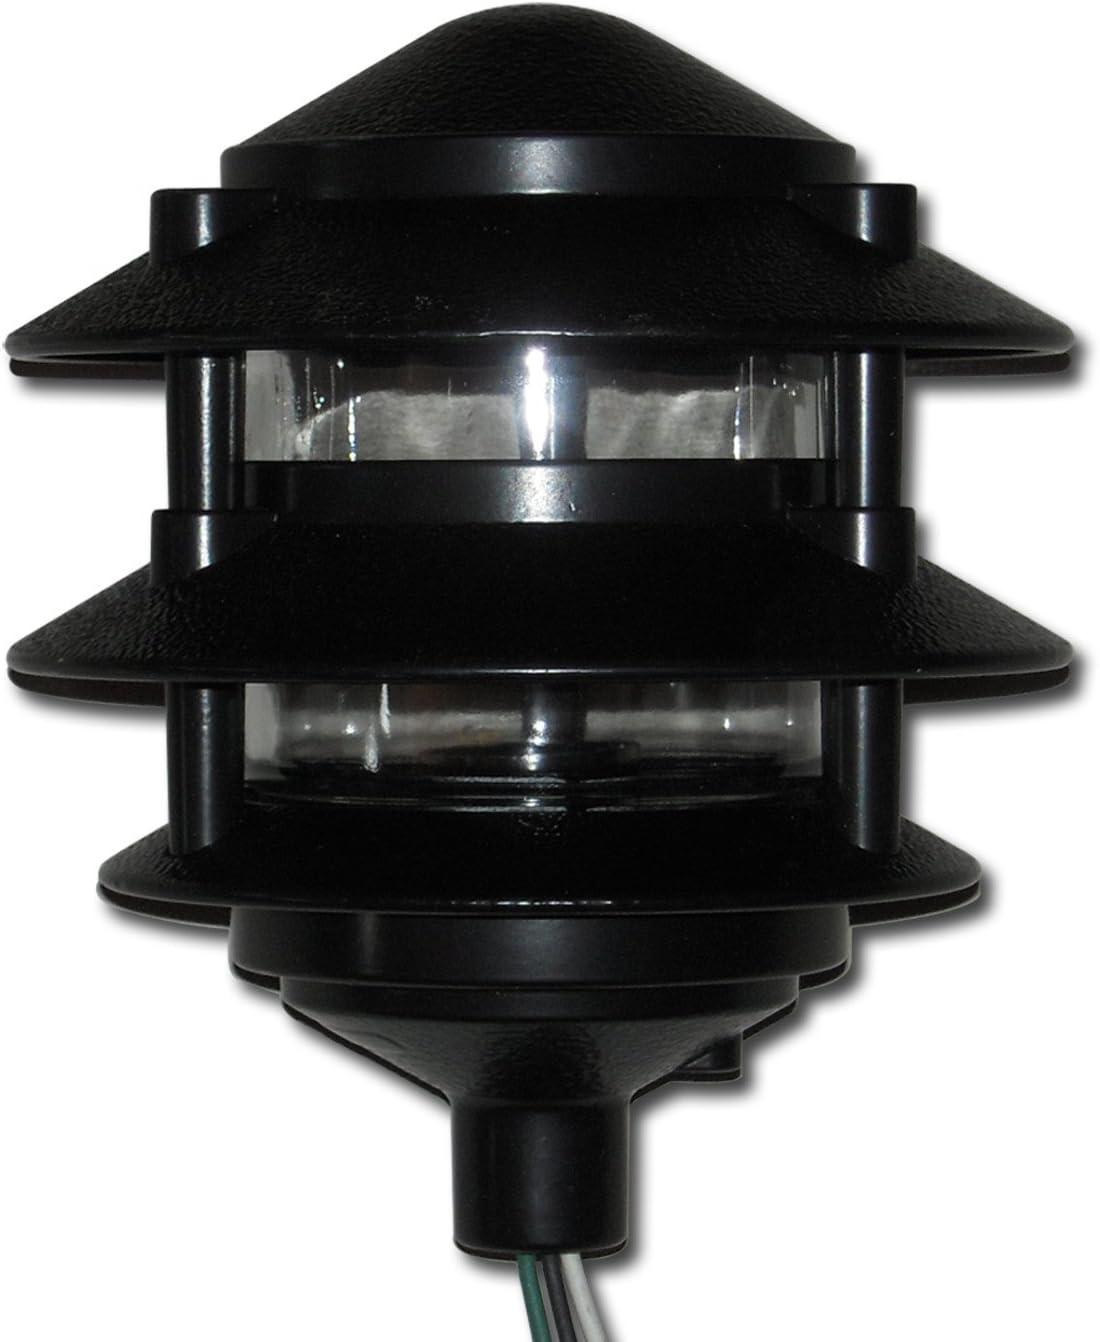 Greenfield PL3TBL Made in USA 3-Tier Black Pathlight, Three